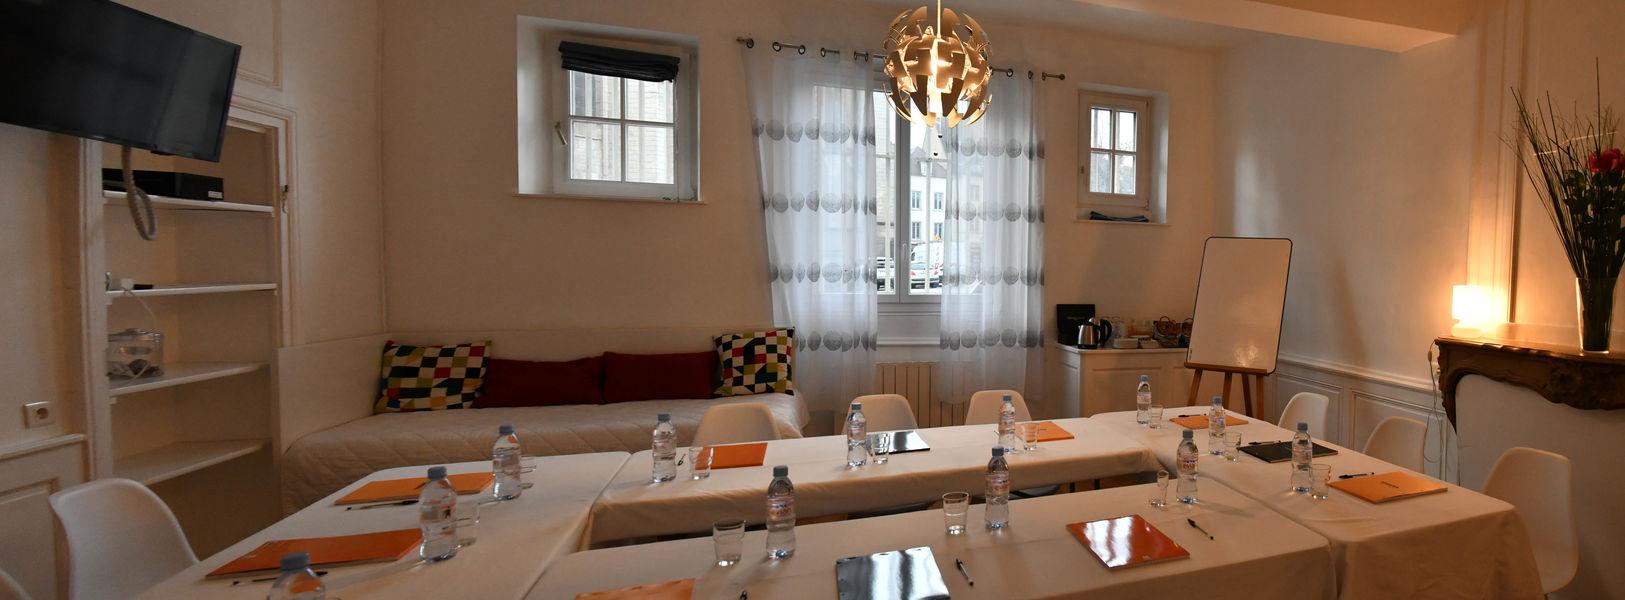 Hôtel Le Chambellan 17